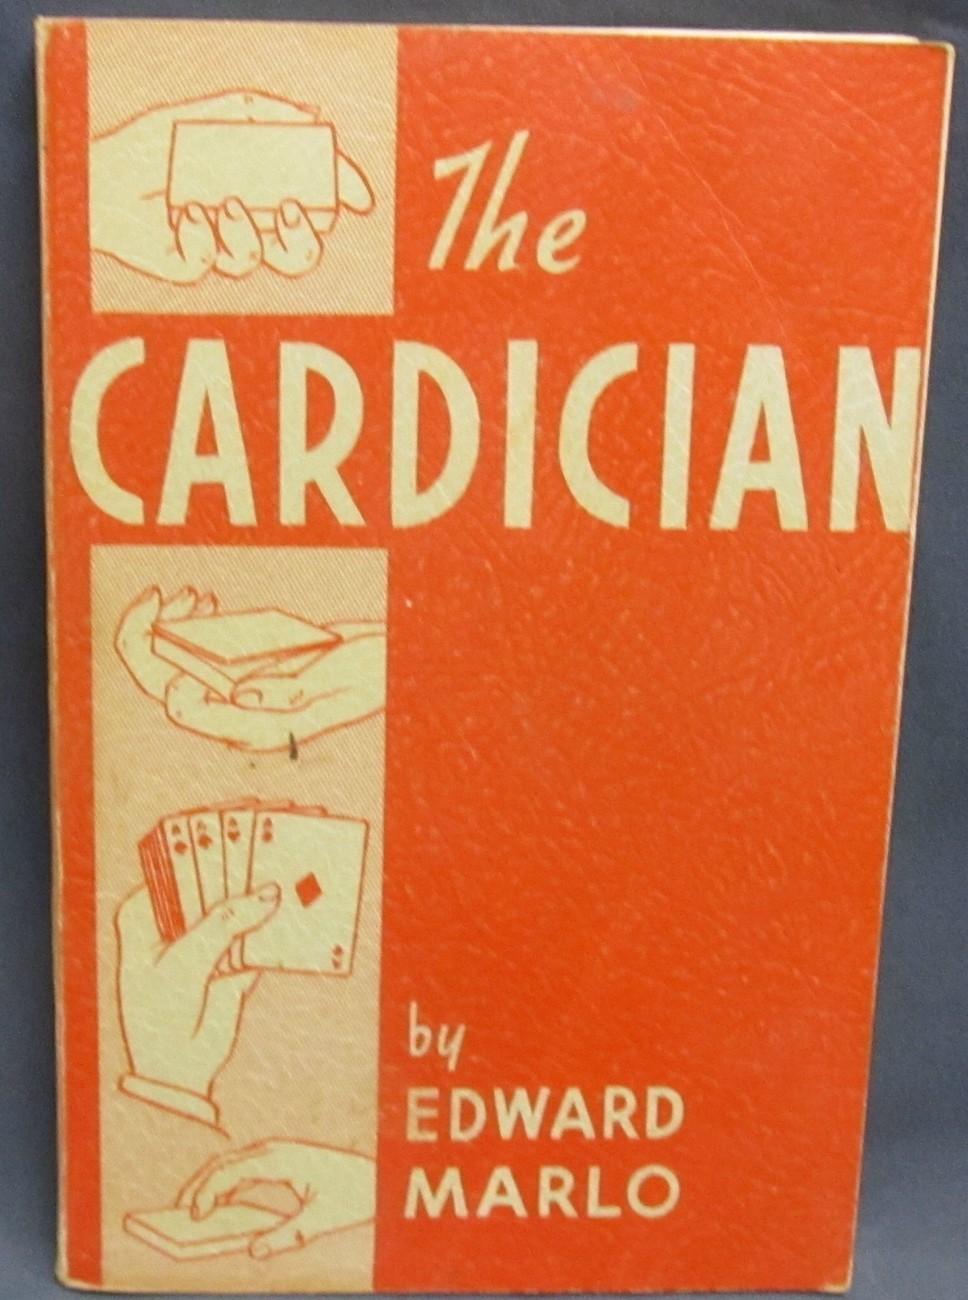 The Cardician by Marlo Edward